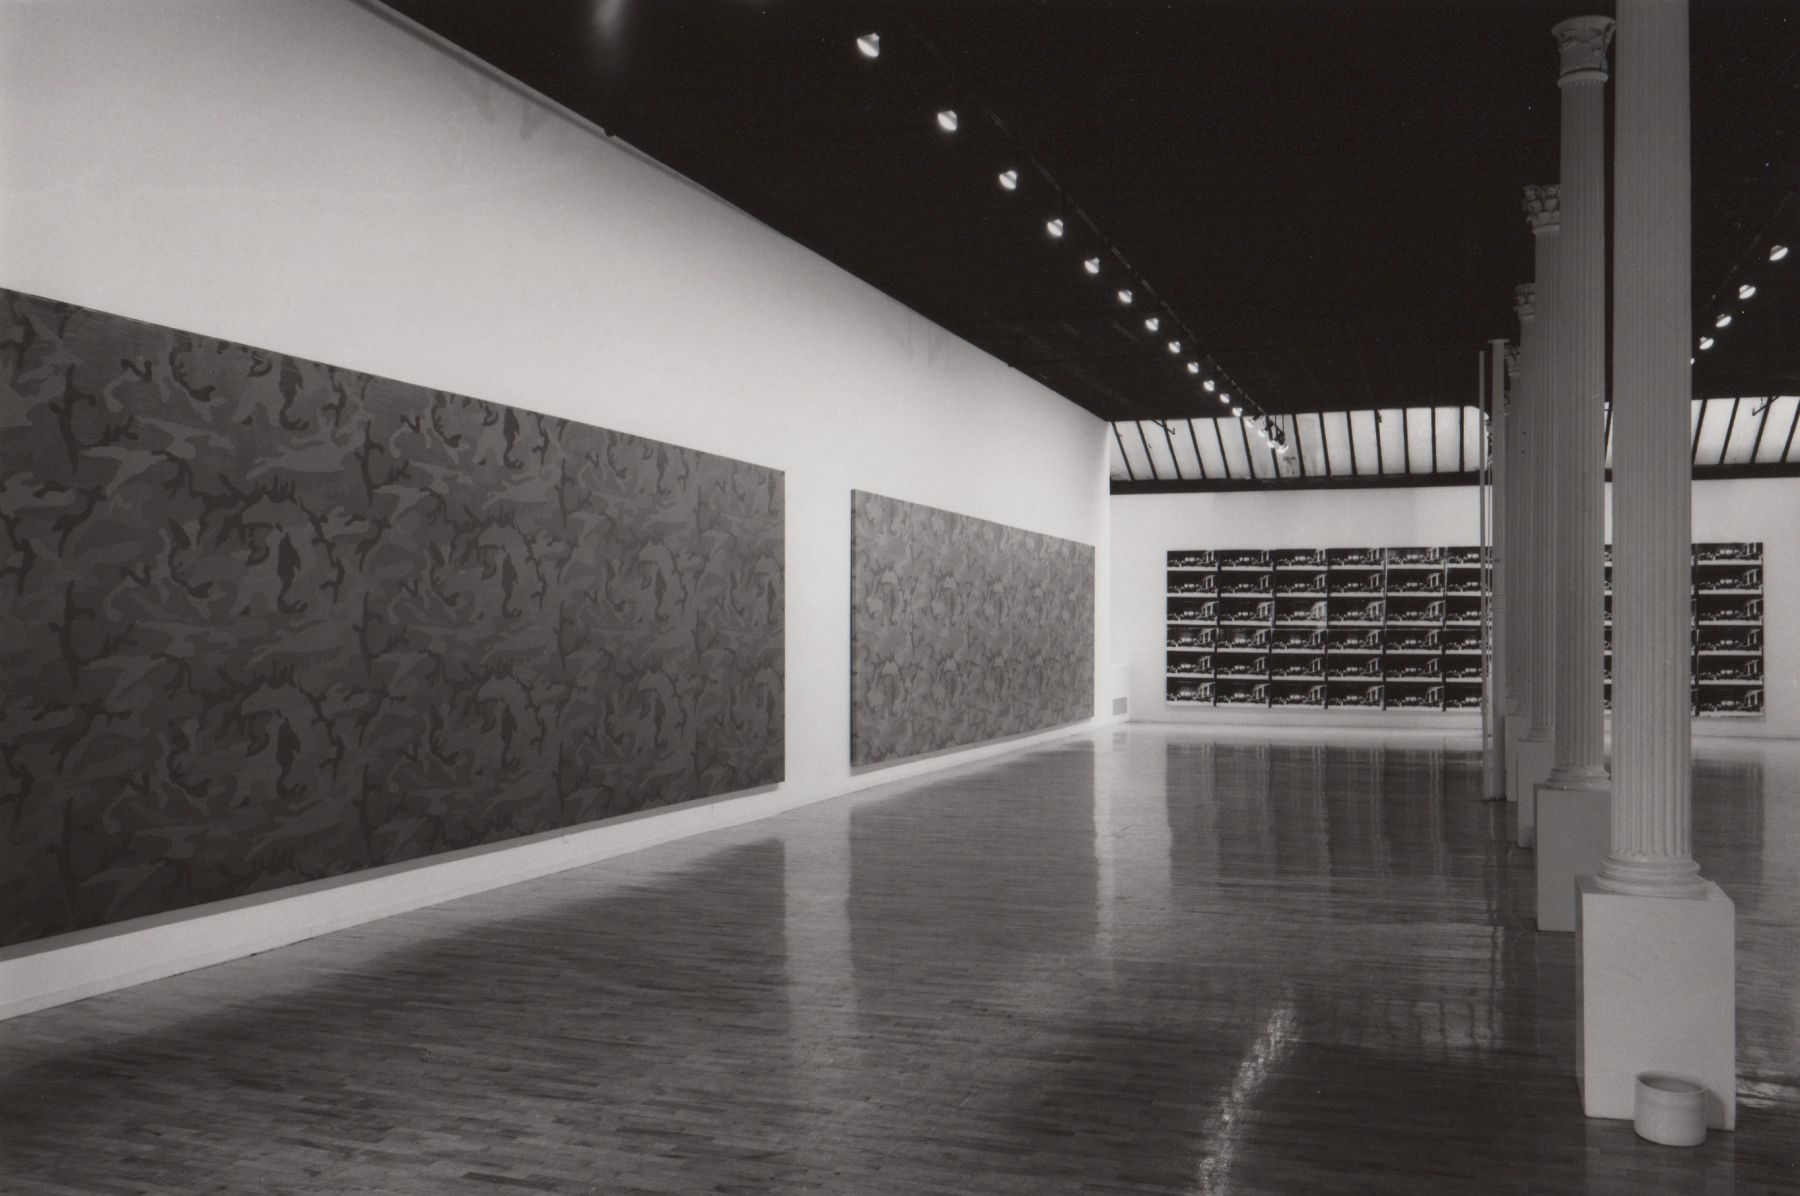 Installation view, Andy Warhol, 142 GREENE